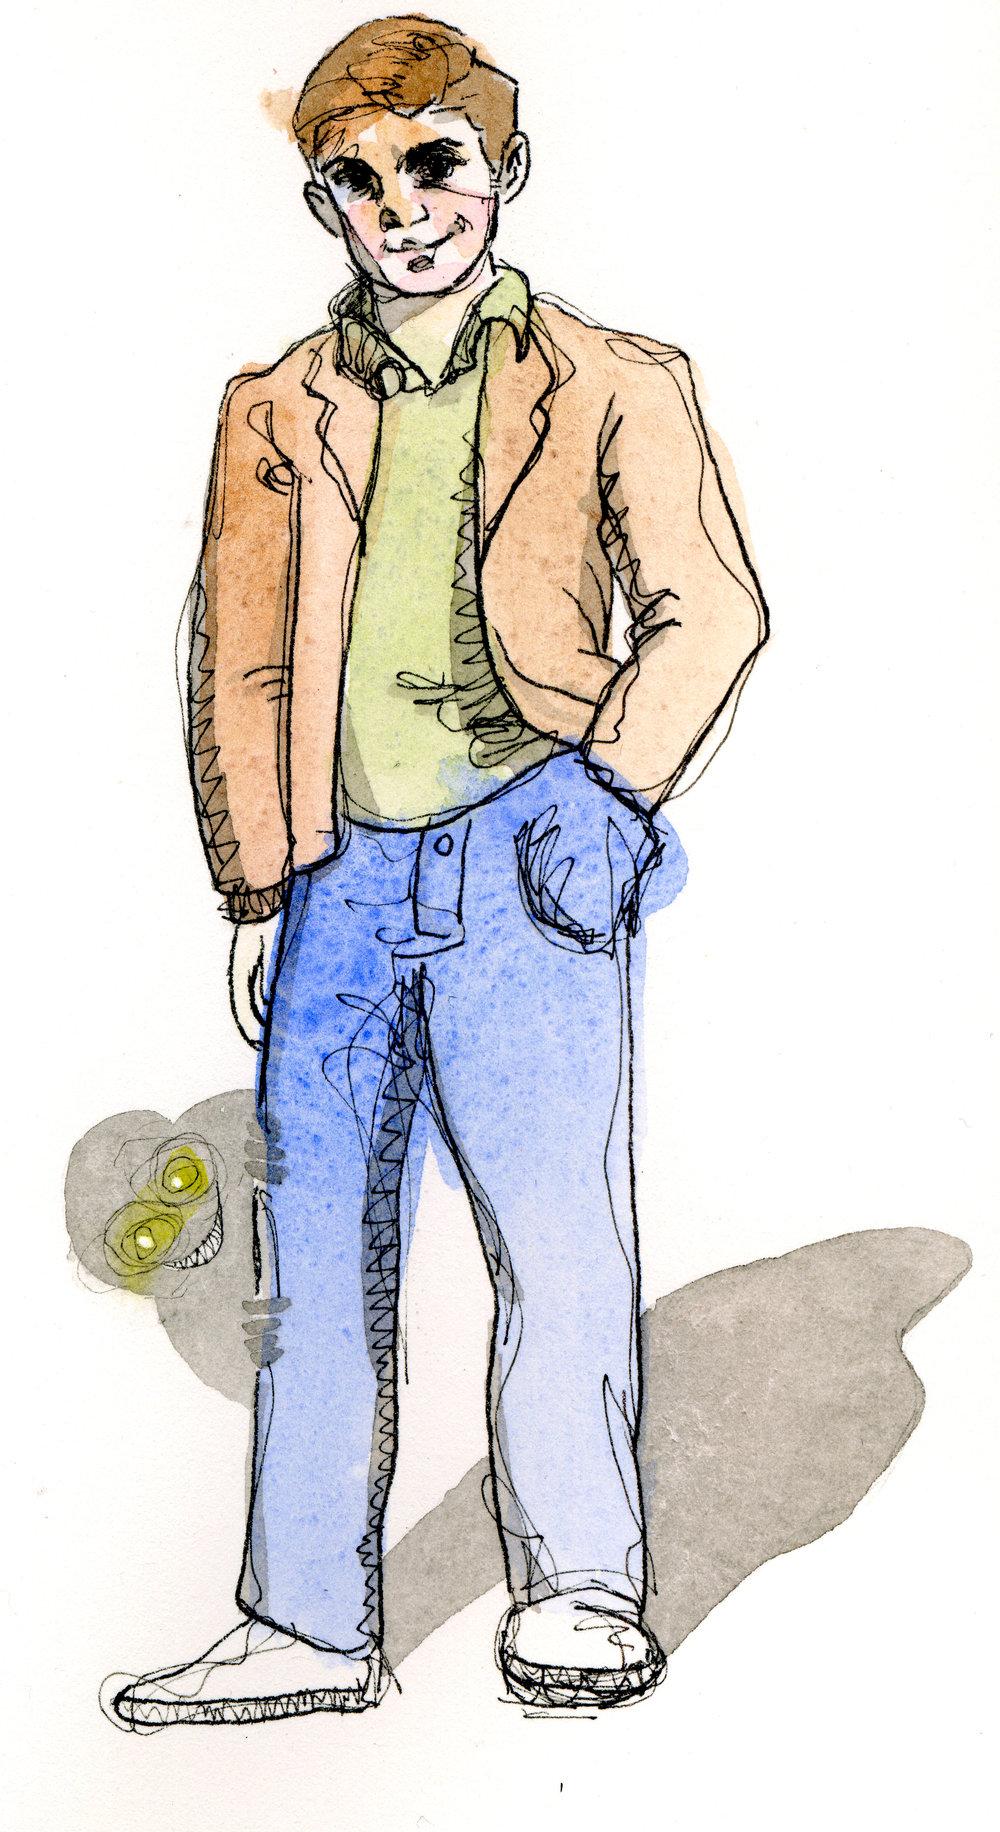 Illustration by David Petersen